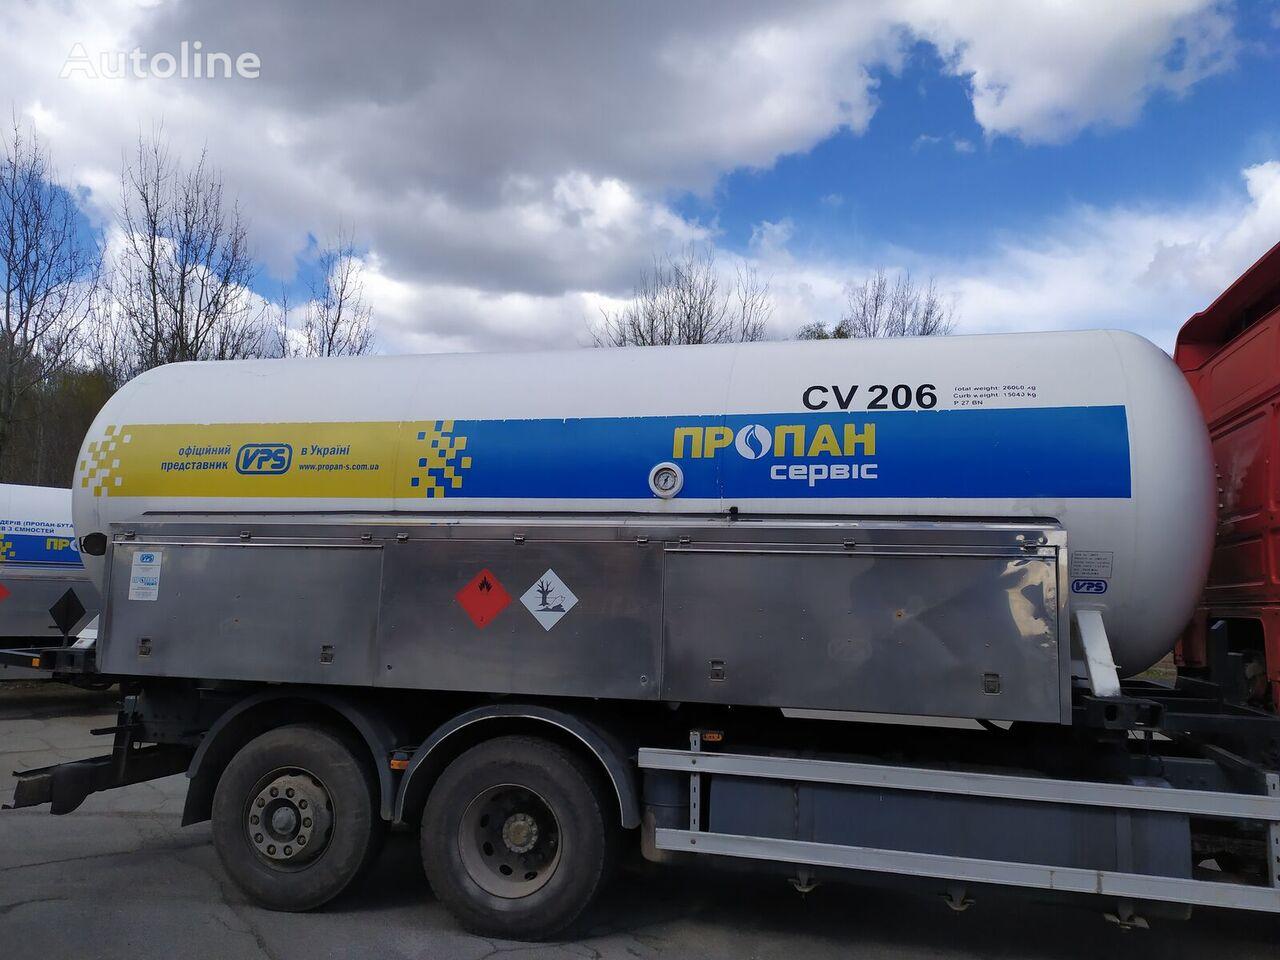 VPS smennoe shassi gāzes cisterna